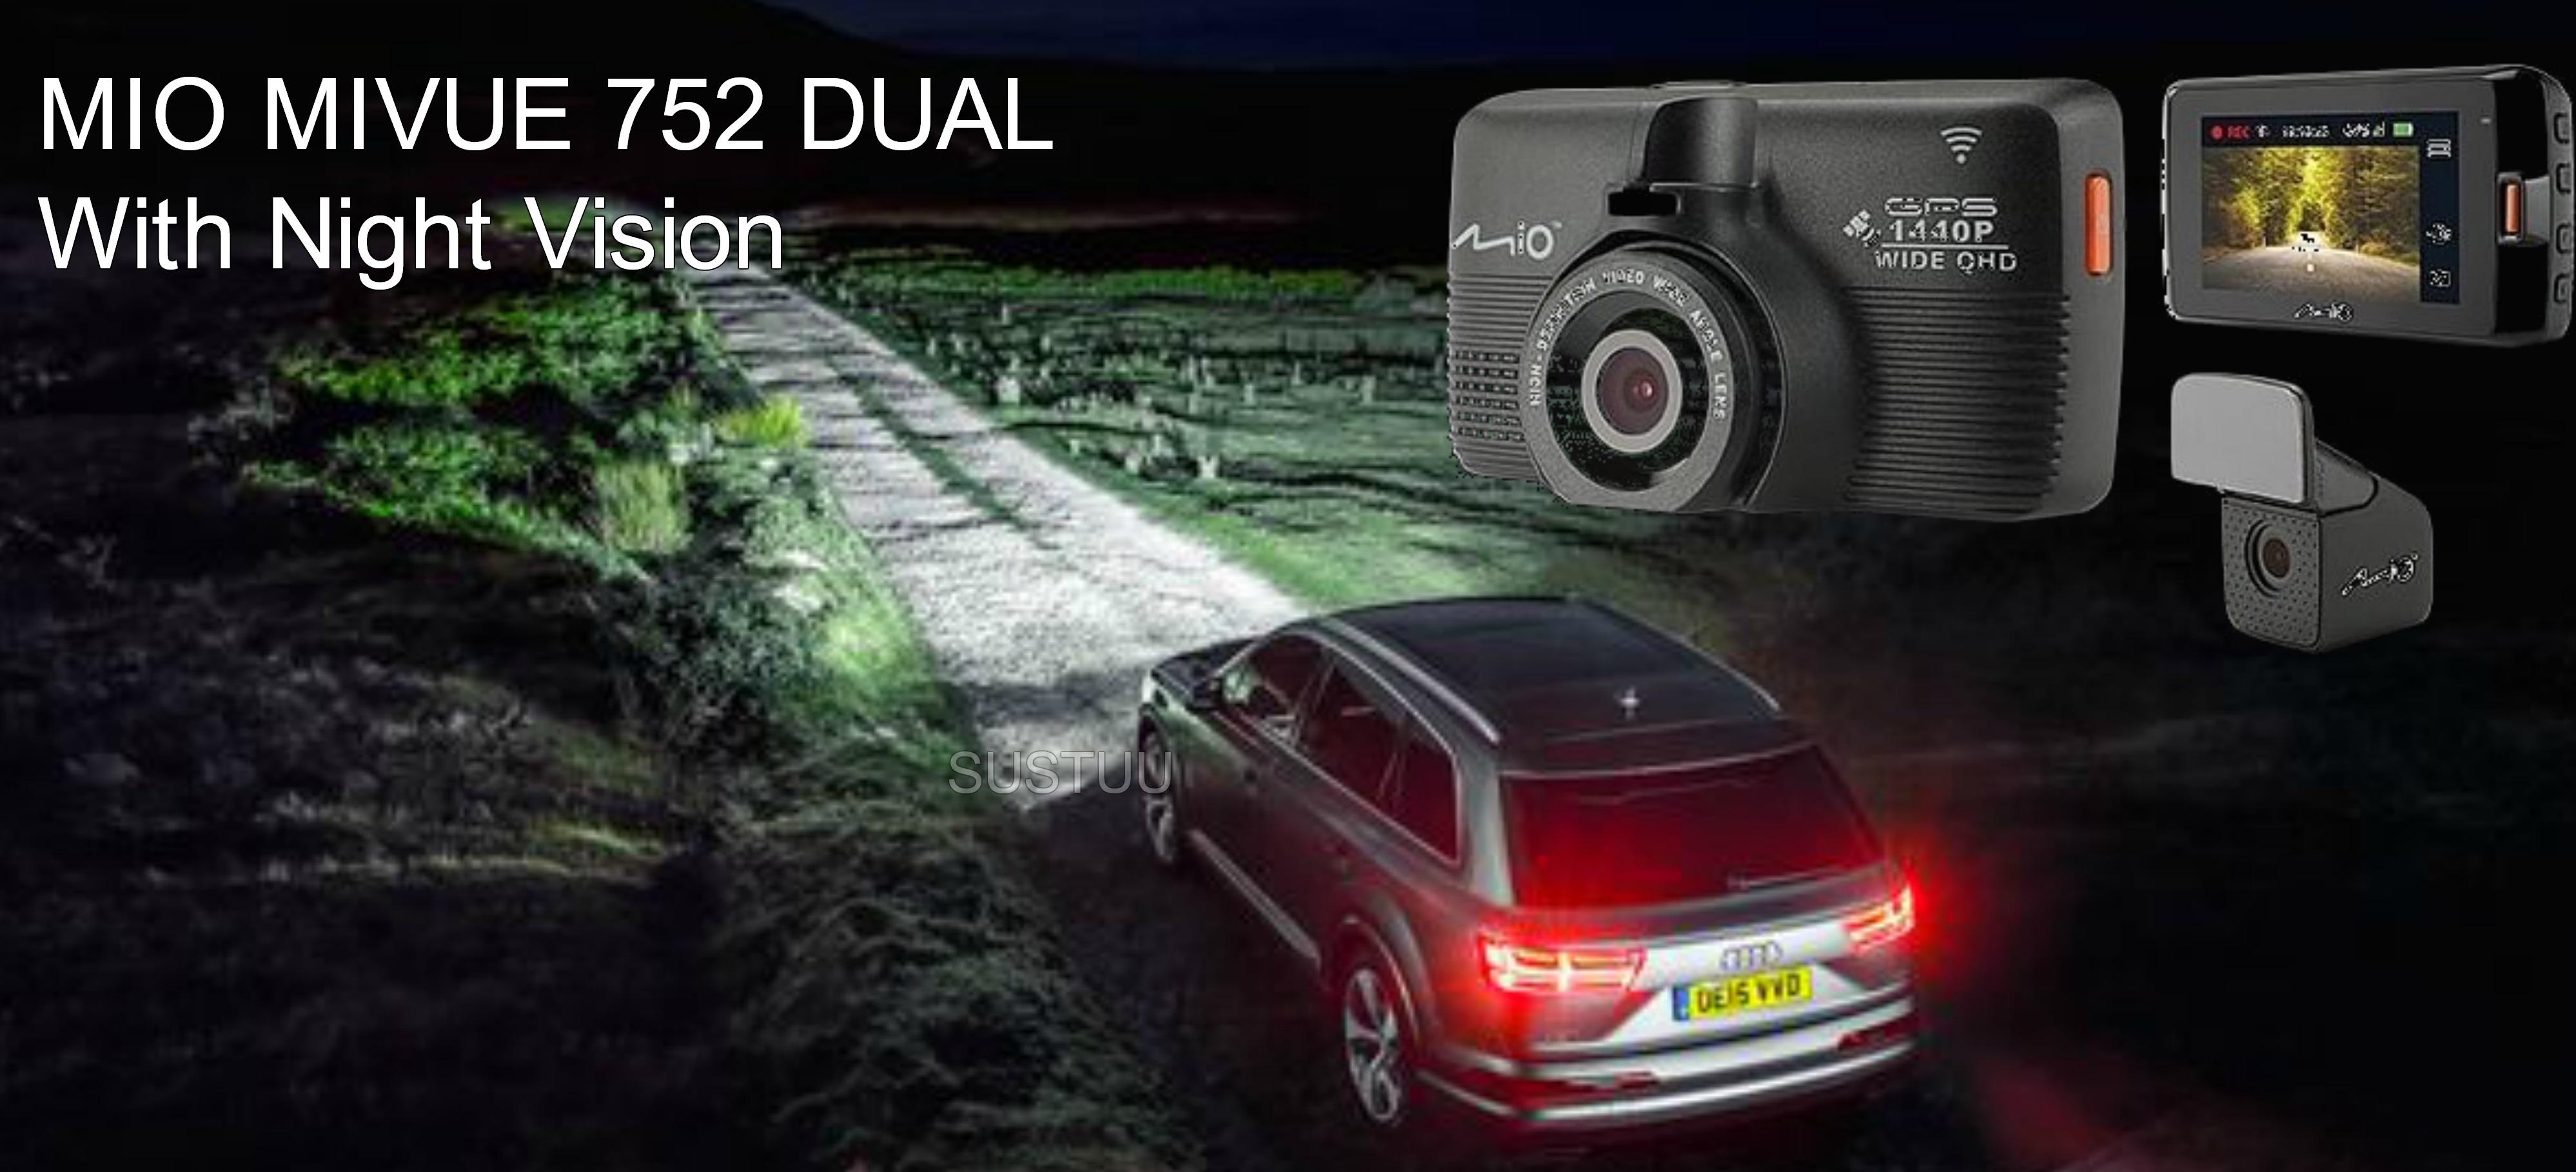 Details about Mio Mivue 752 WIFI Dual GPS Car Dash Camera│1440P QHD Video  Recording│G-sensor